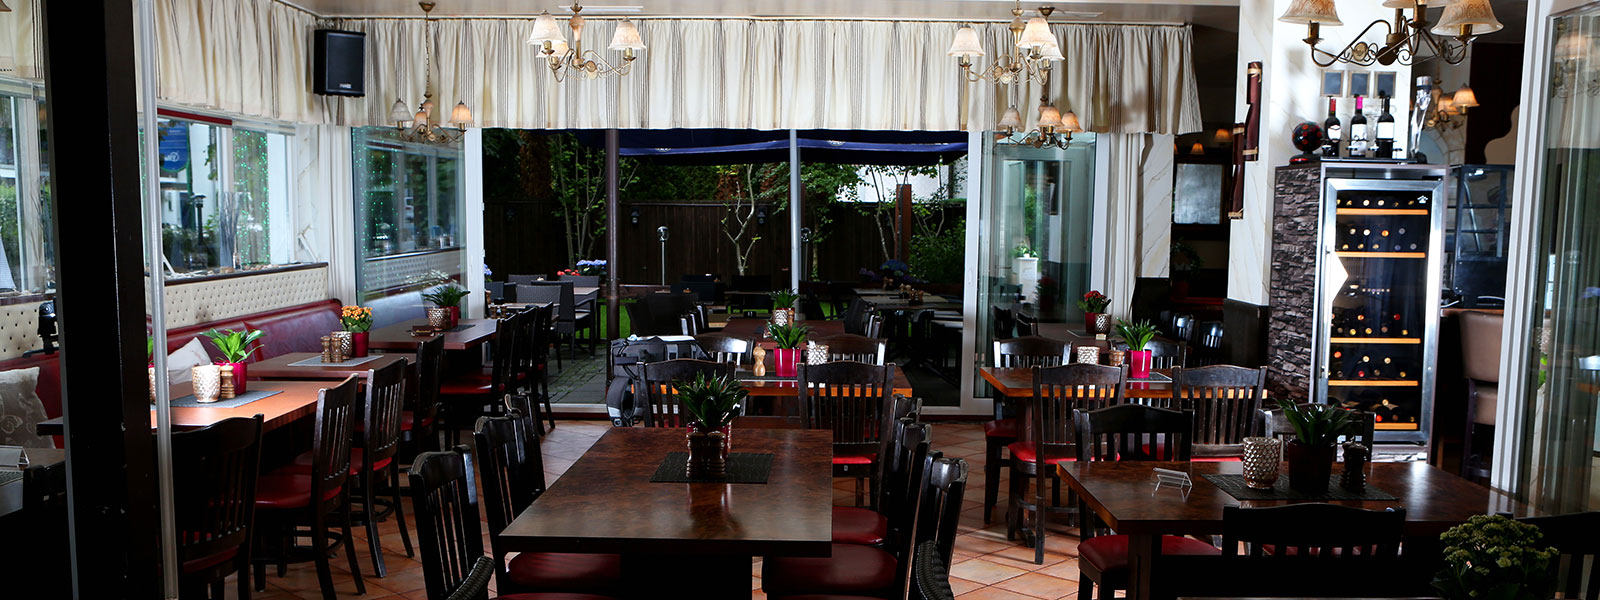 Griannis-Restaurant-Ottobrunn